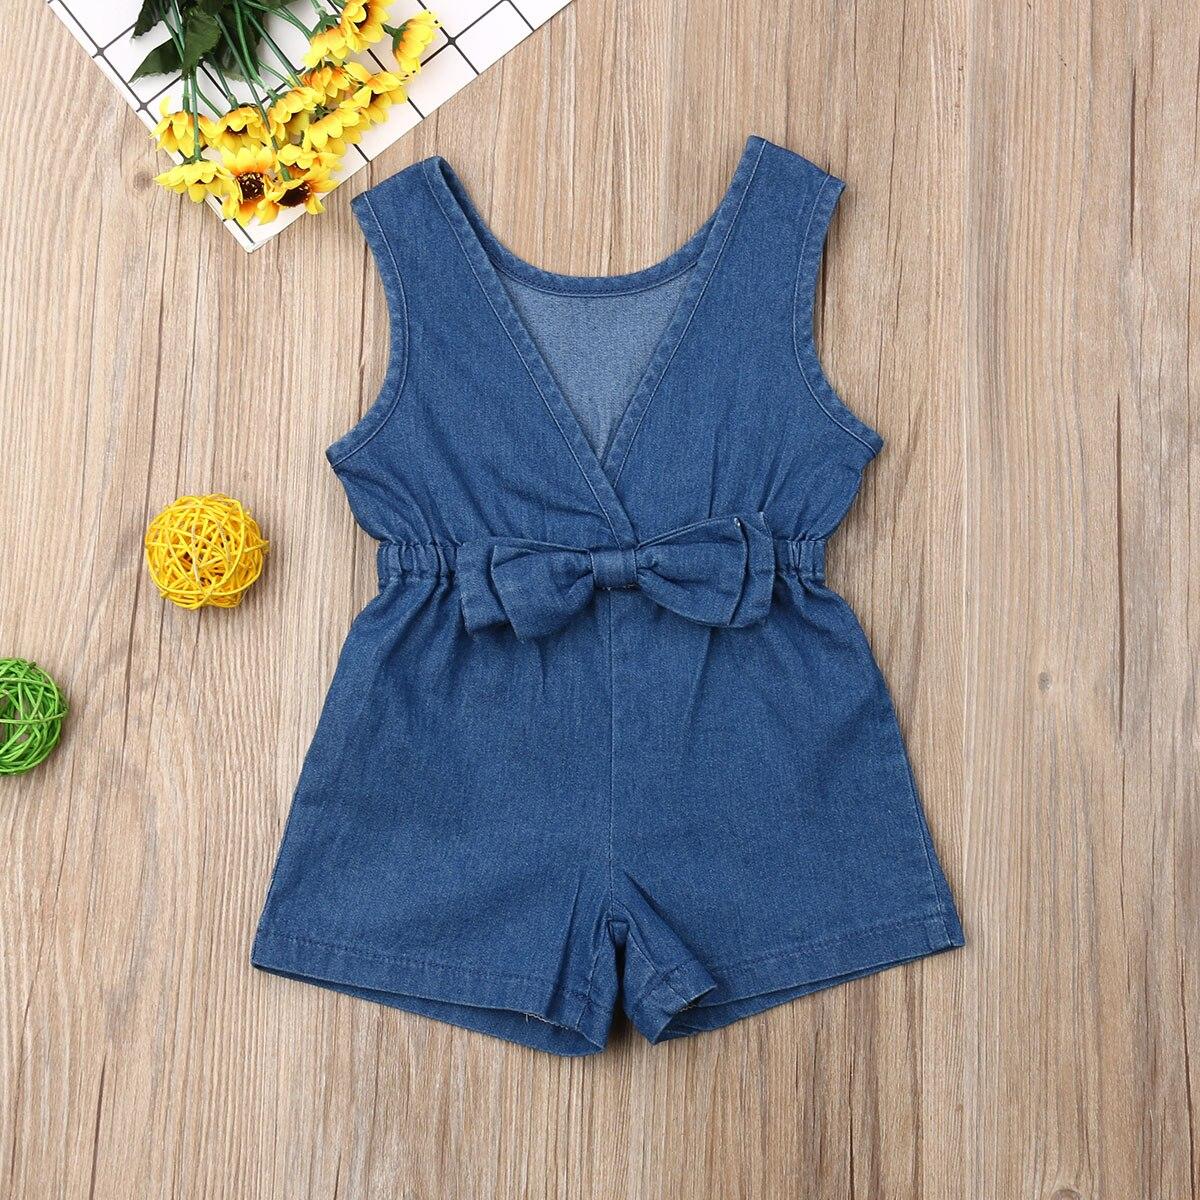 Infant Newborn Baby Girls Denim Jumpsuit Cotton Clothes Outfits